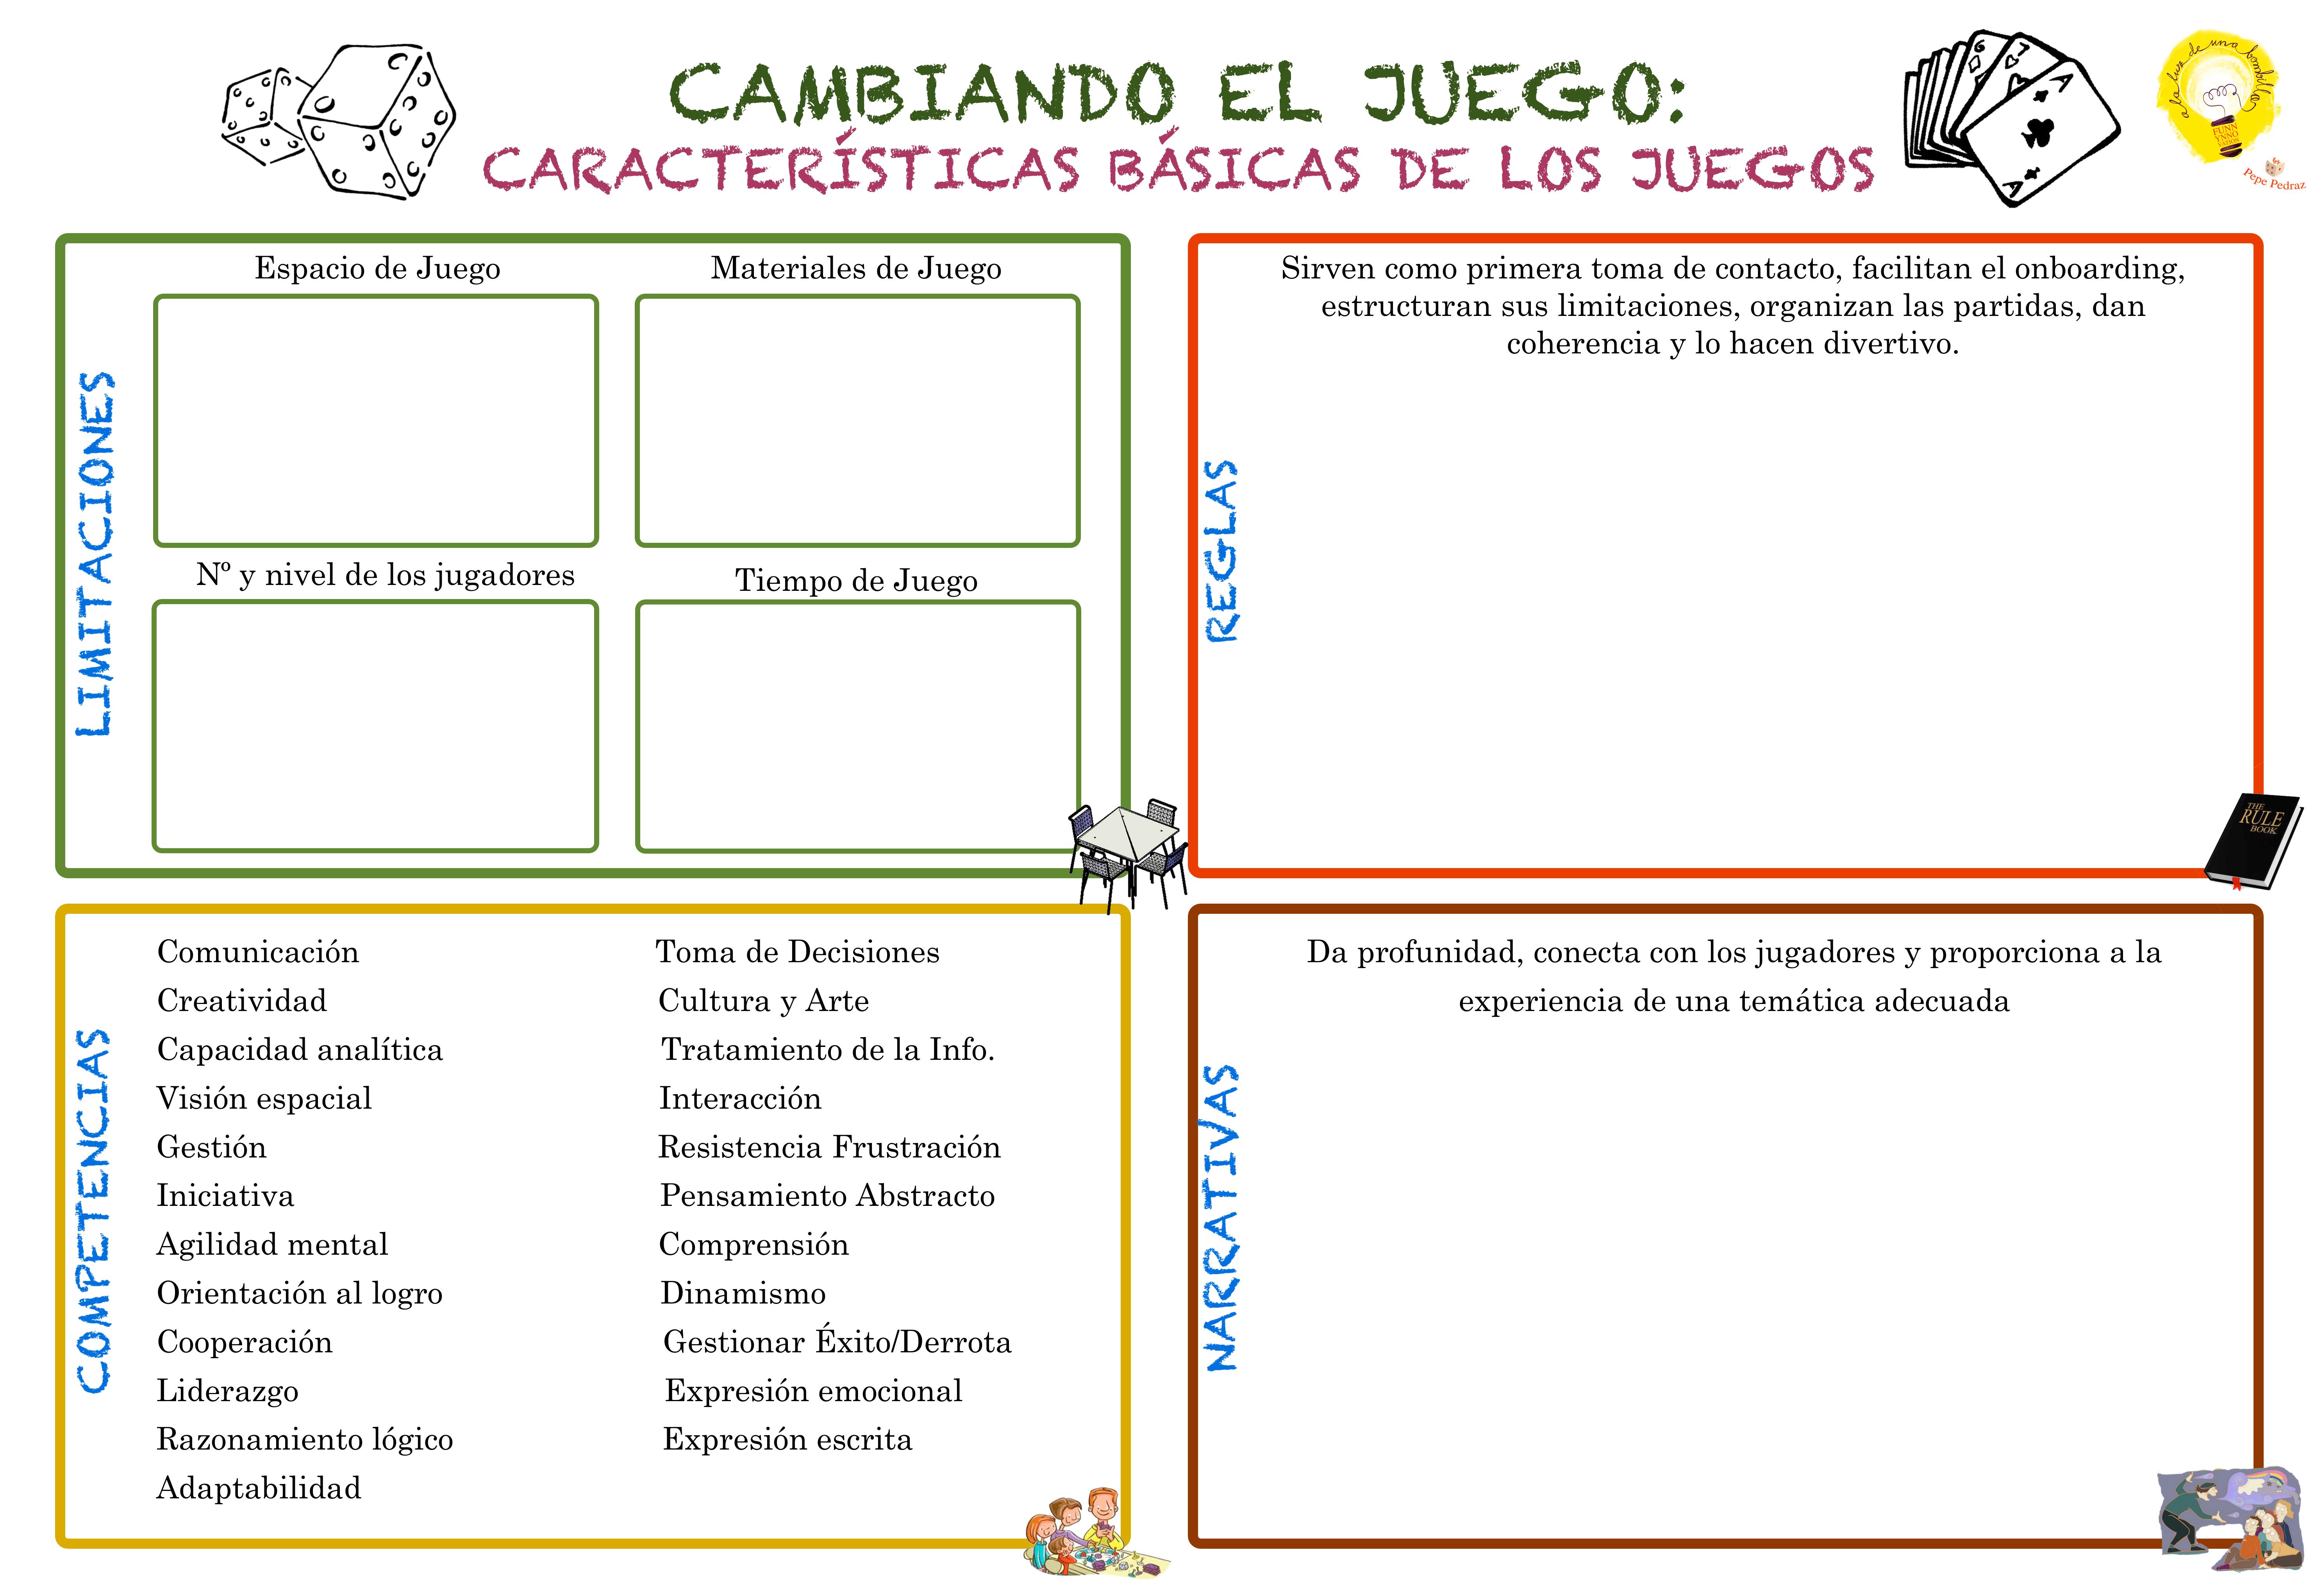 https://www.alaluzdeunabombilla.com/wp-content/uploads/2017/01/Cambiar-y-deconstruir-Juego.jpg